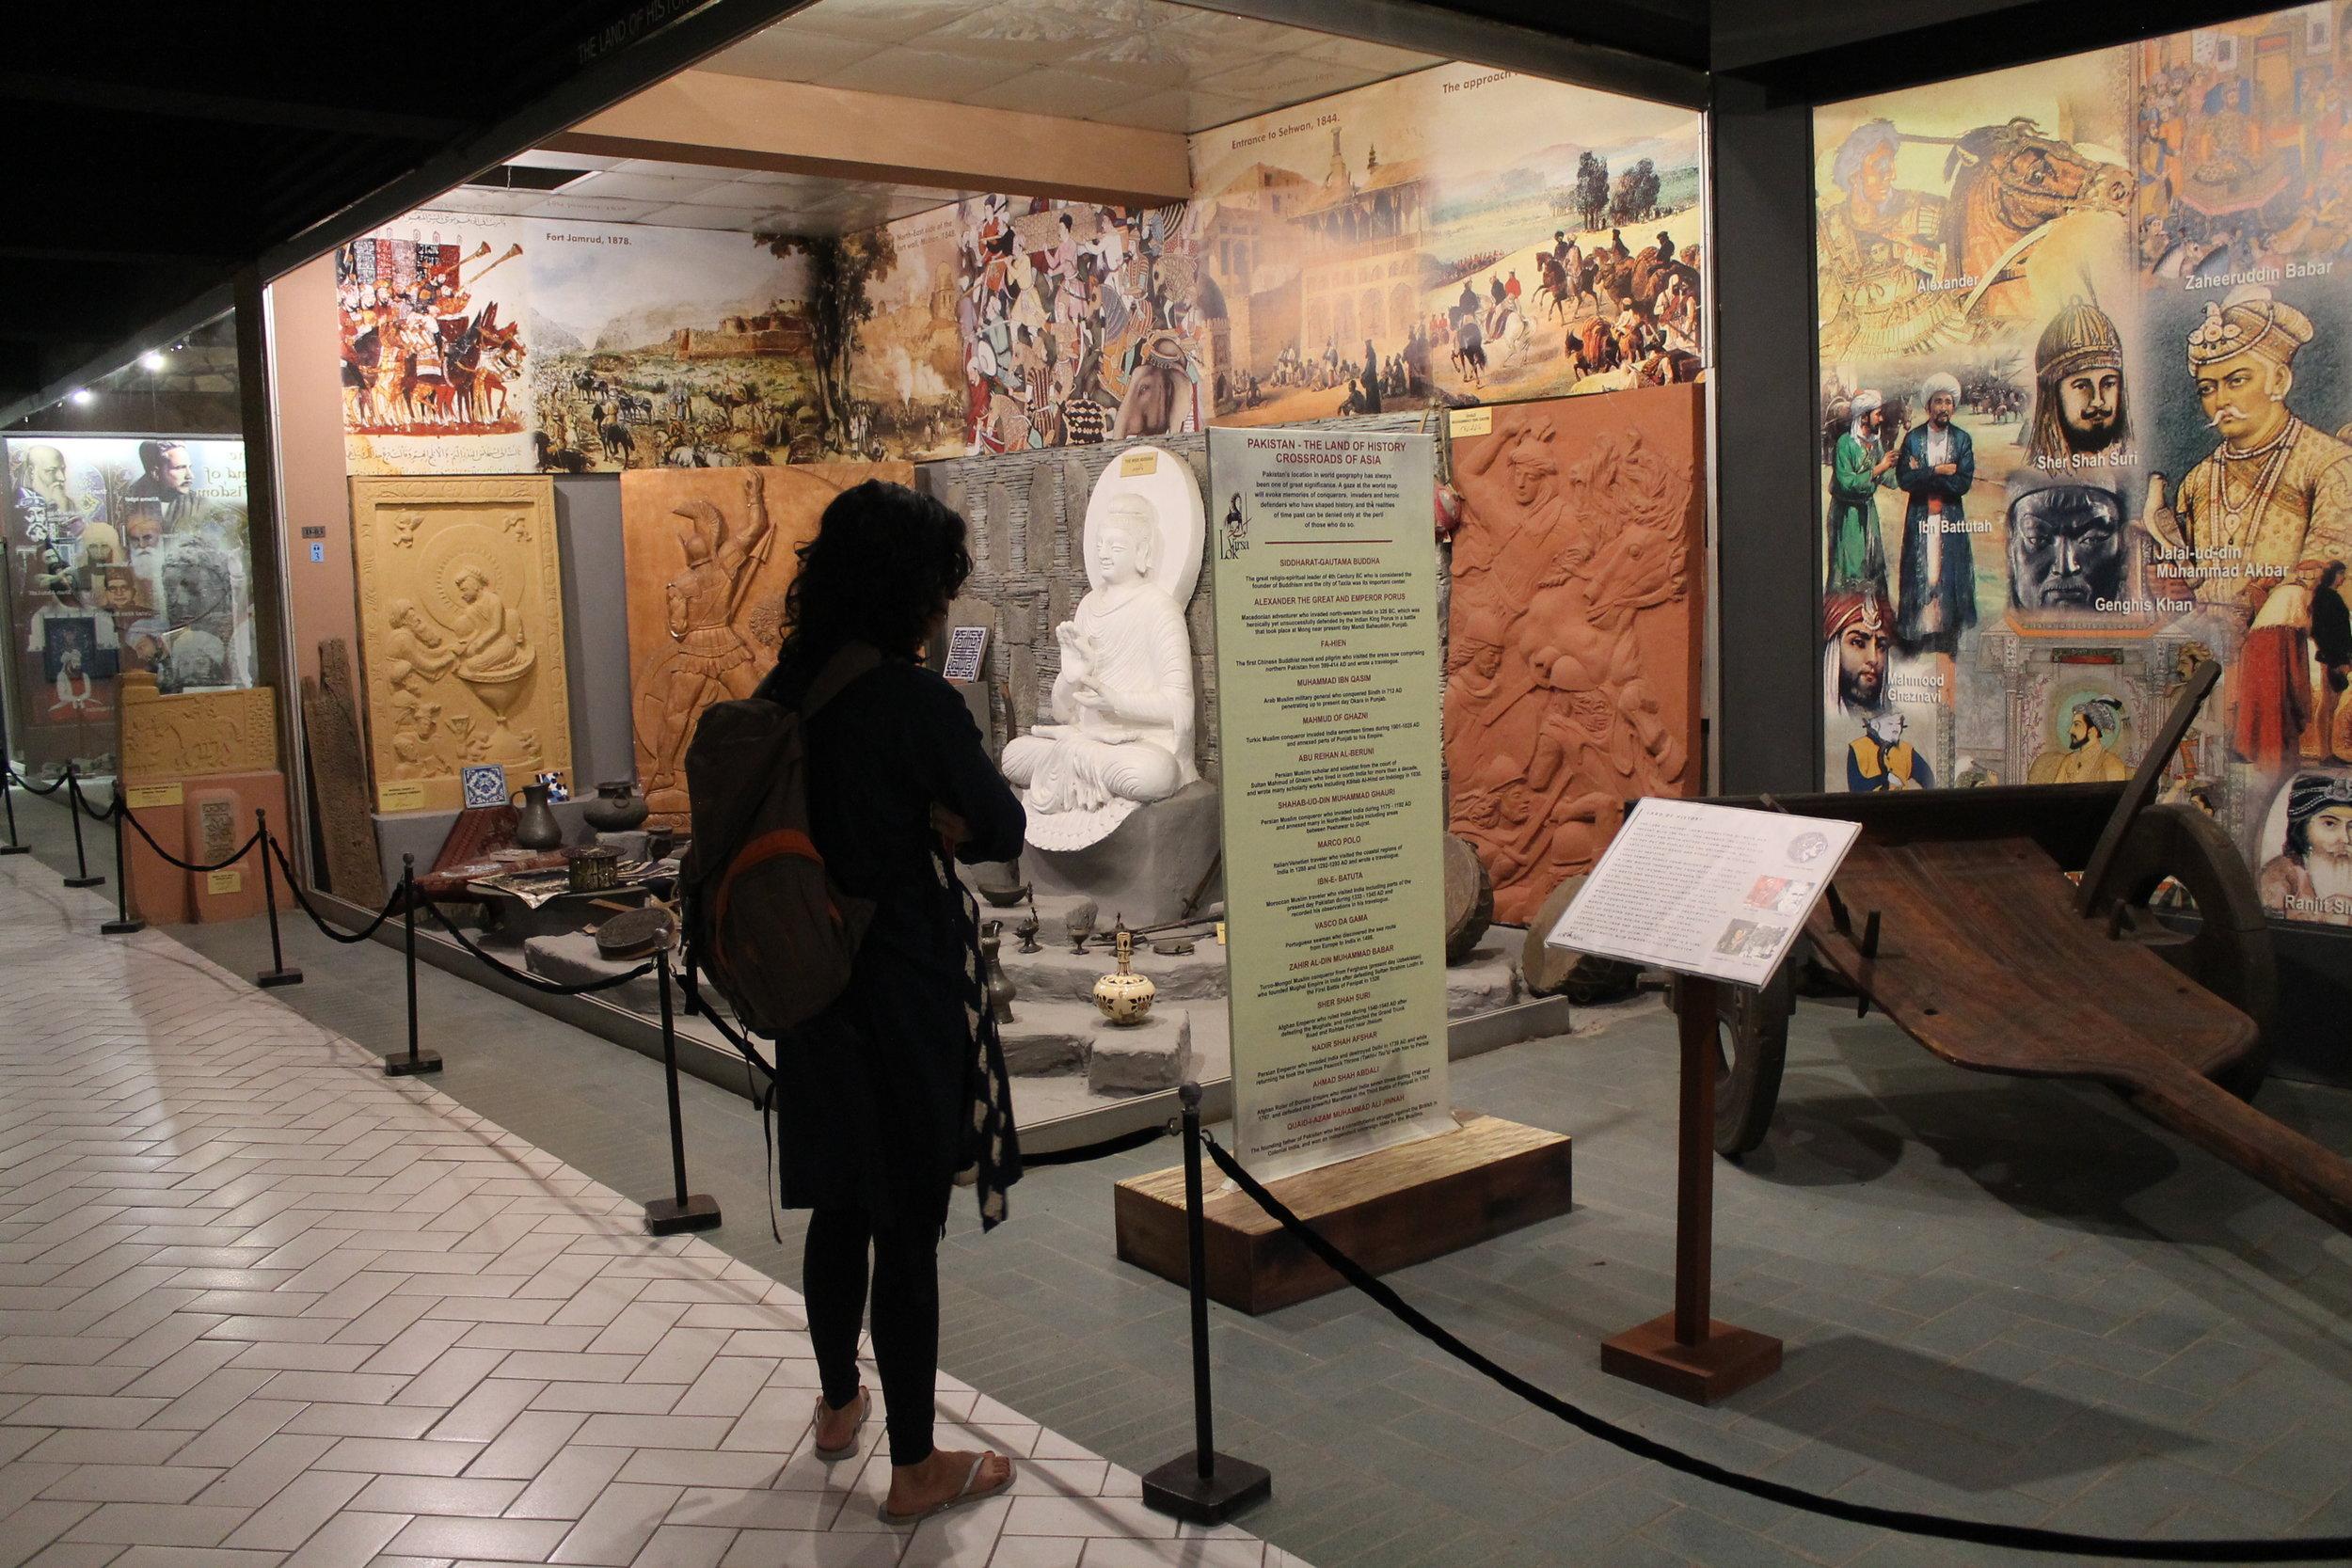 Visiting the Lok Virsa Heritage Museum